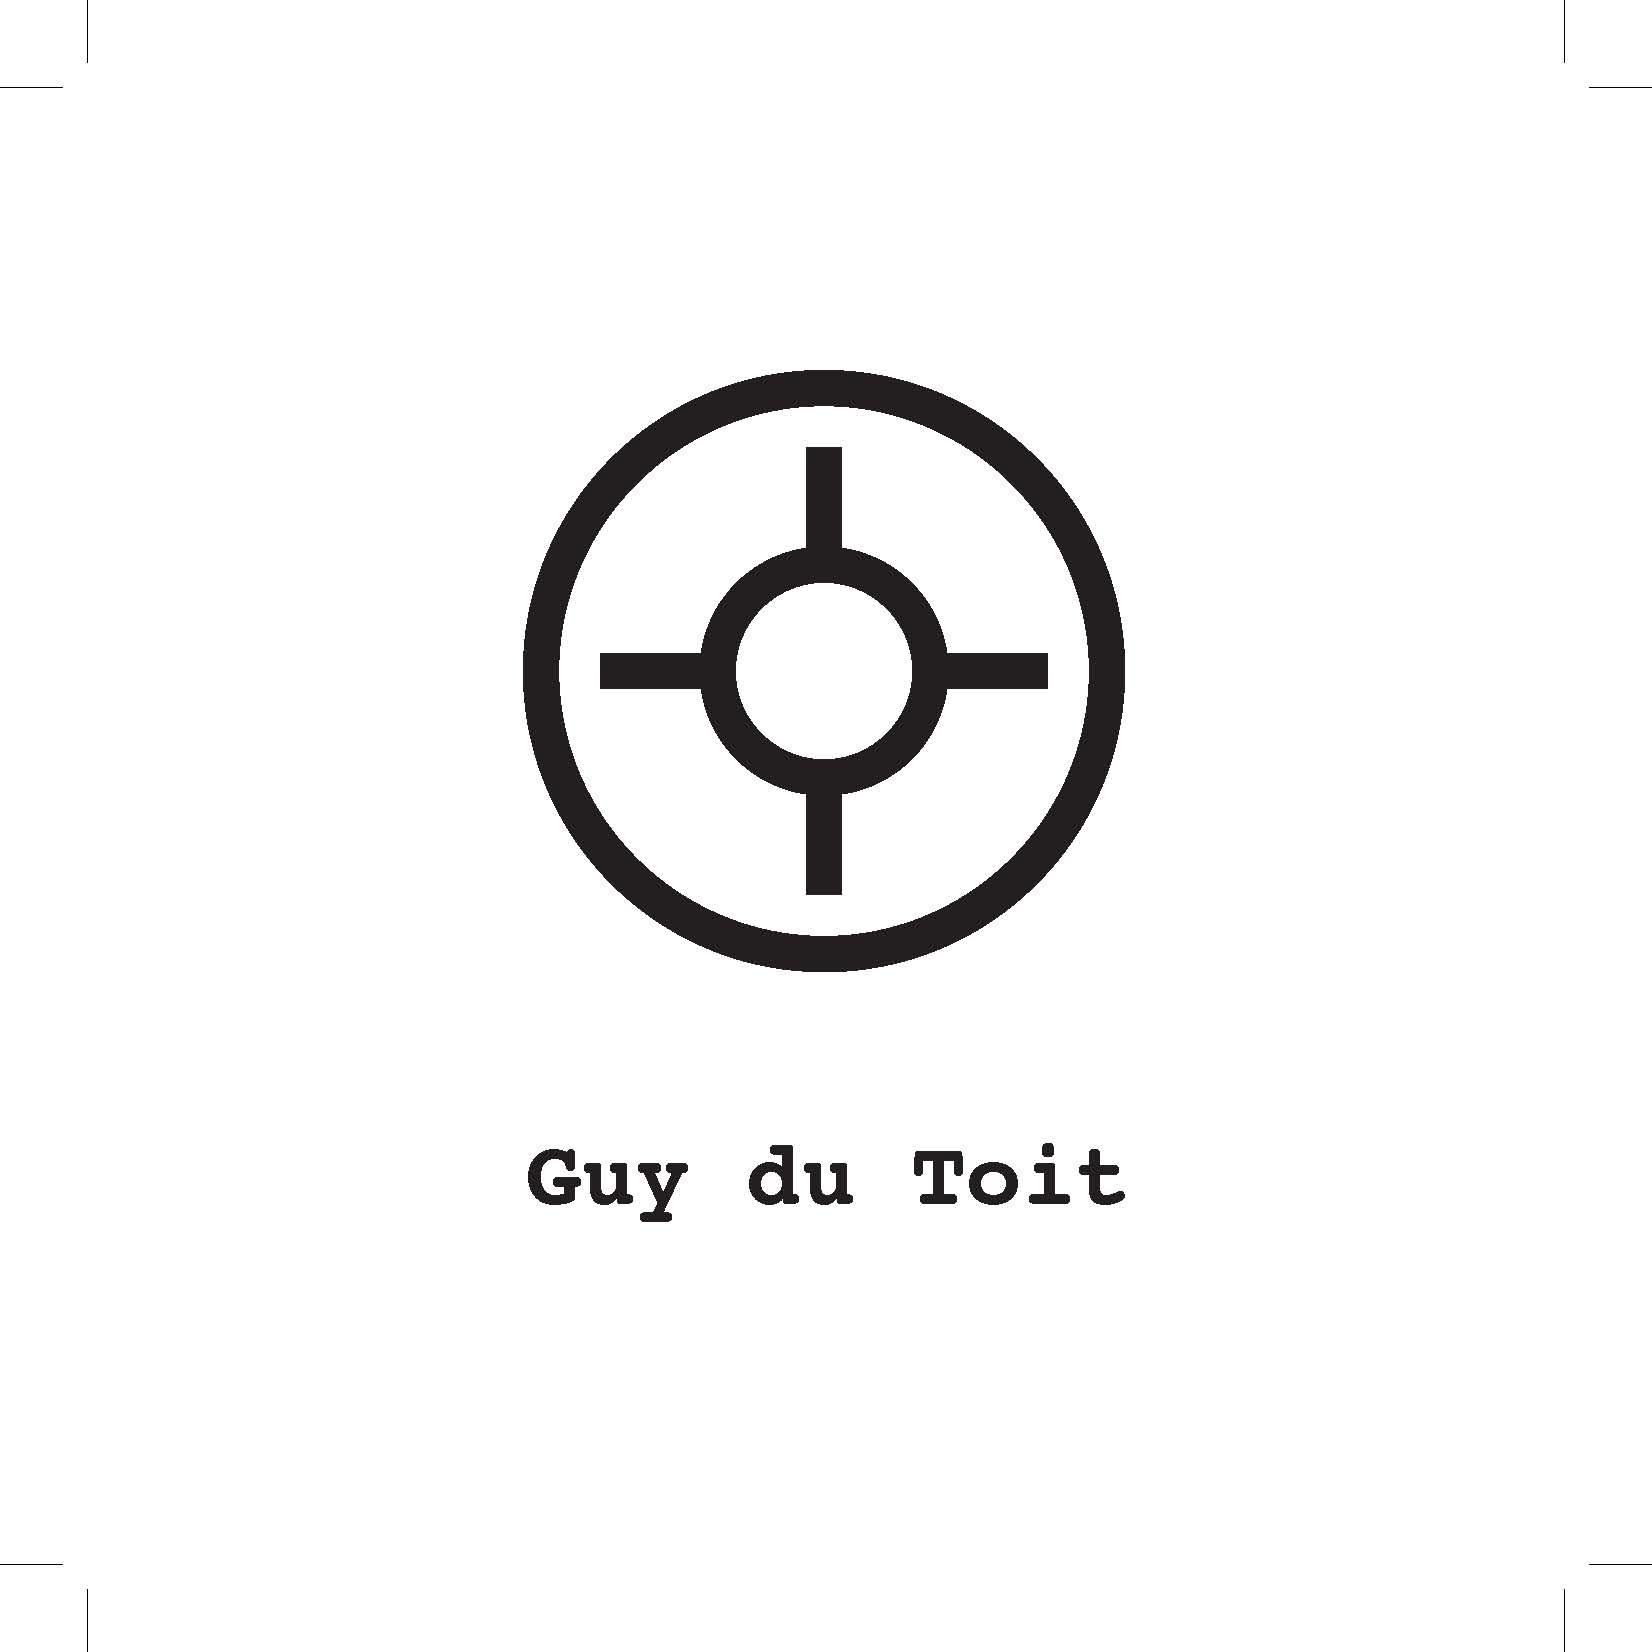 MAP Southafrica - Guy du Toit